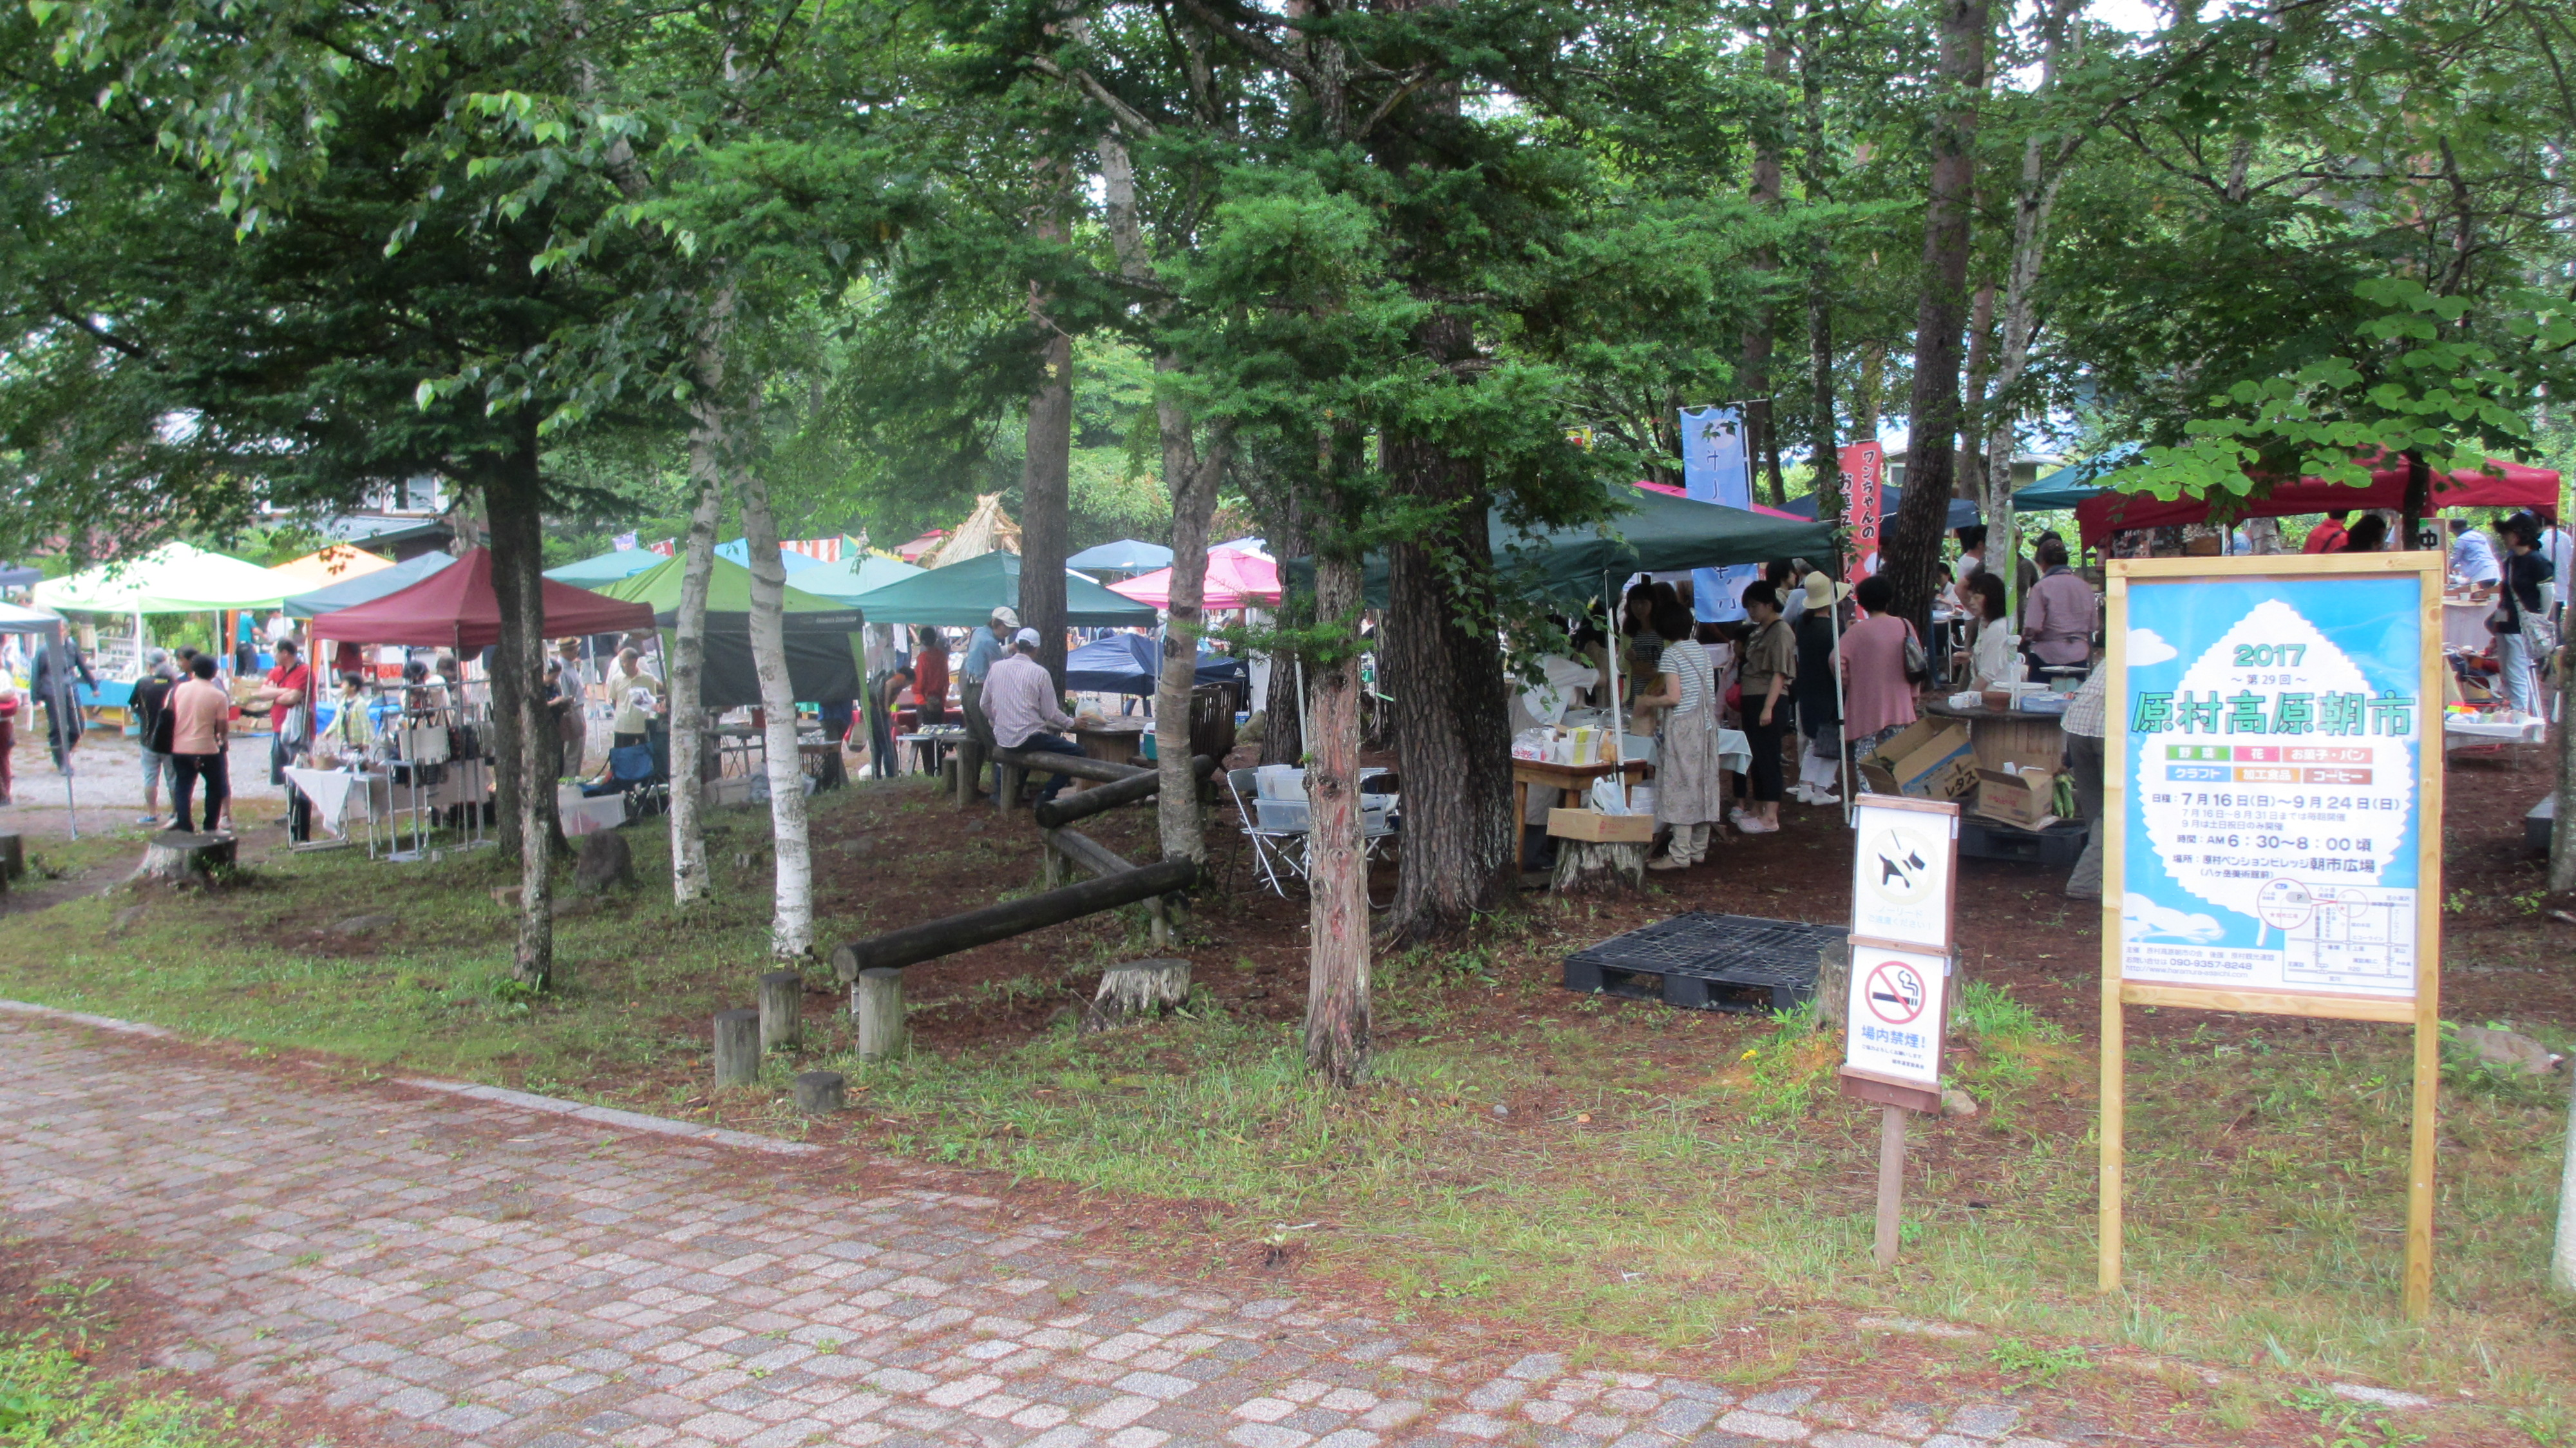 http://www.alpico.co.jp/shikinomori/news/images/IMG_8318.JPG